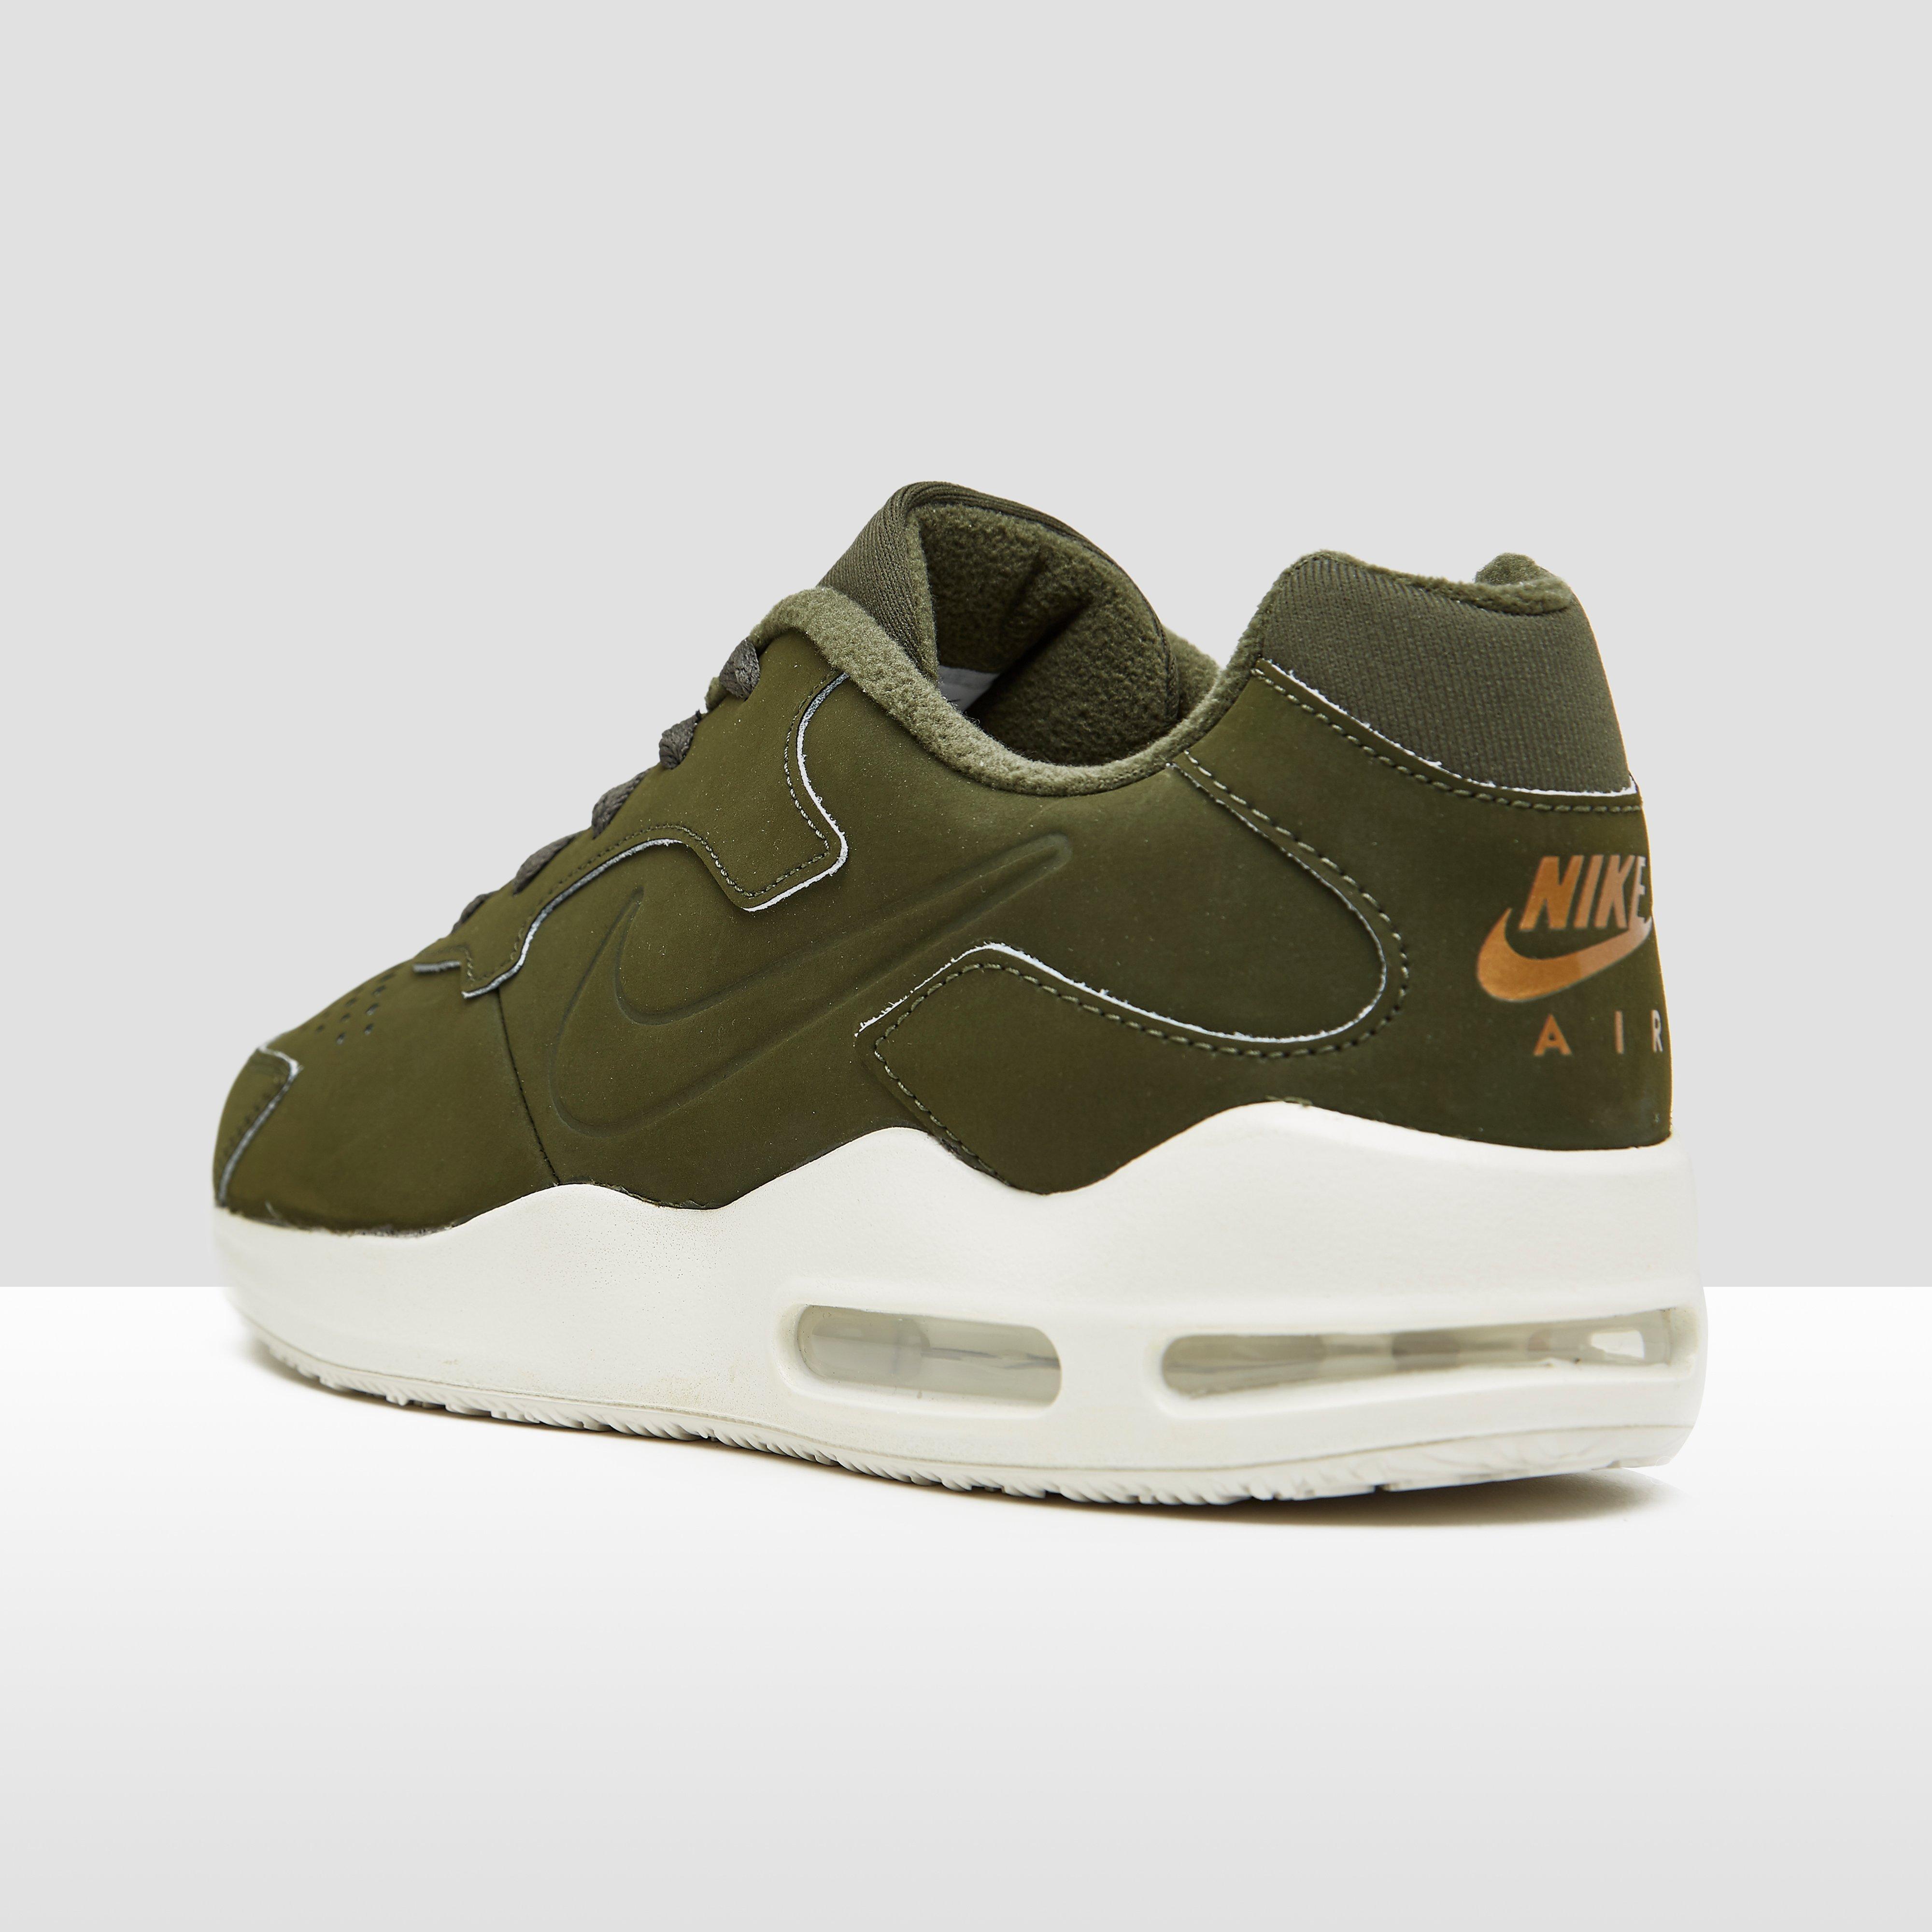 Tanjun Chaussures Vert Nike Pour Les Hommes gZ7cfag